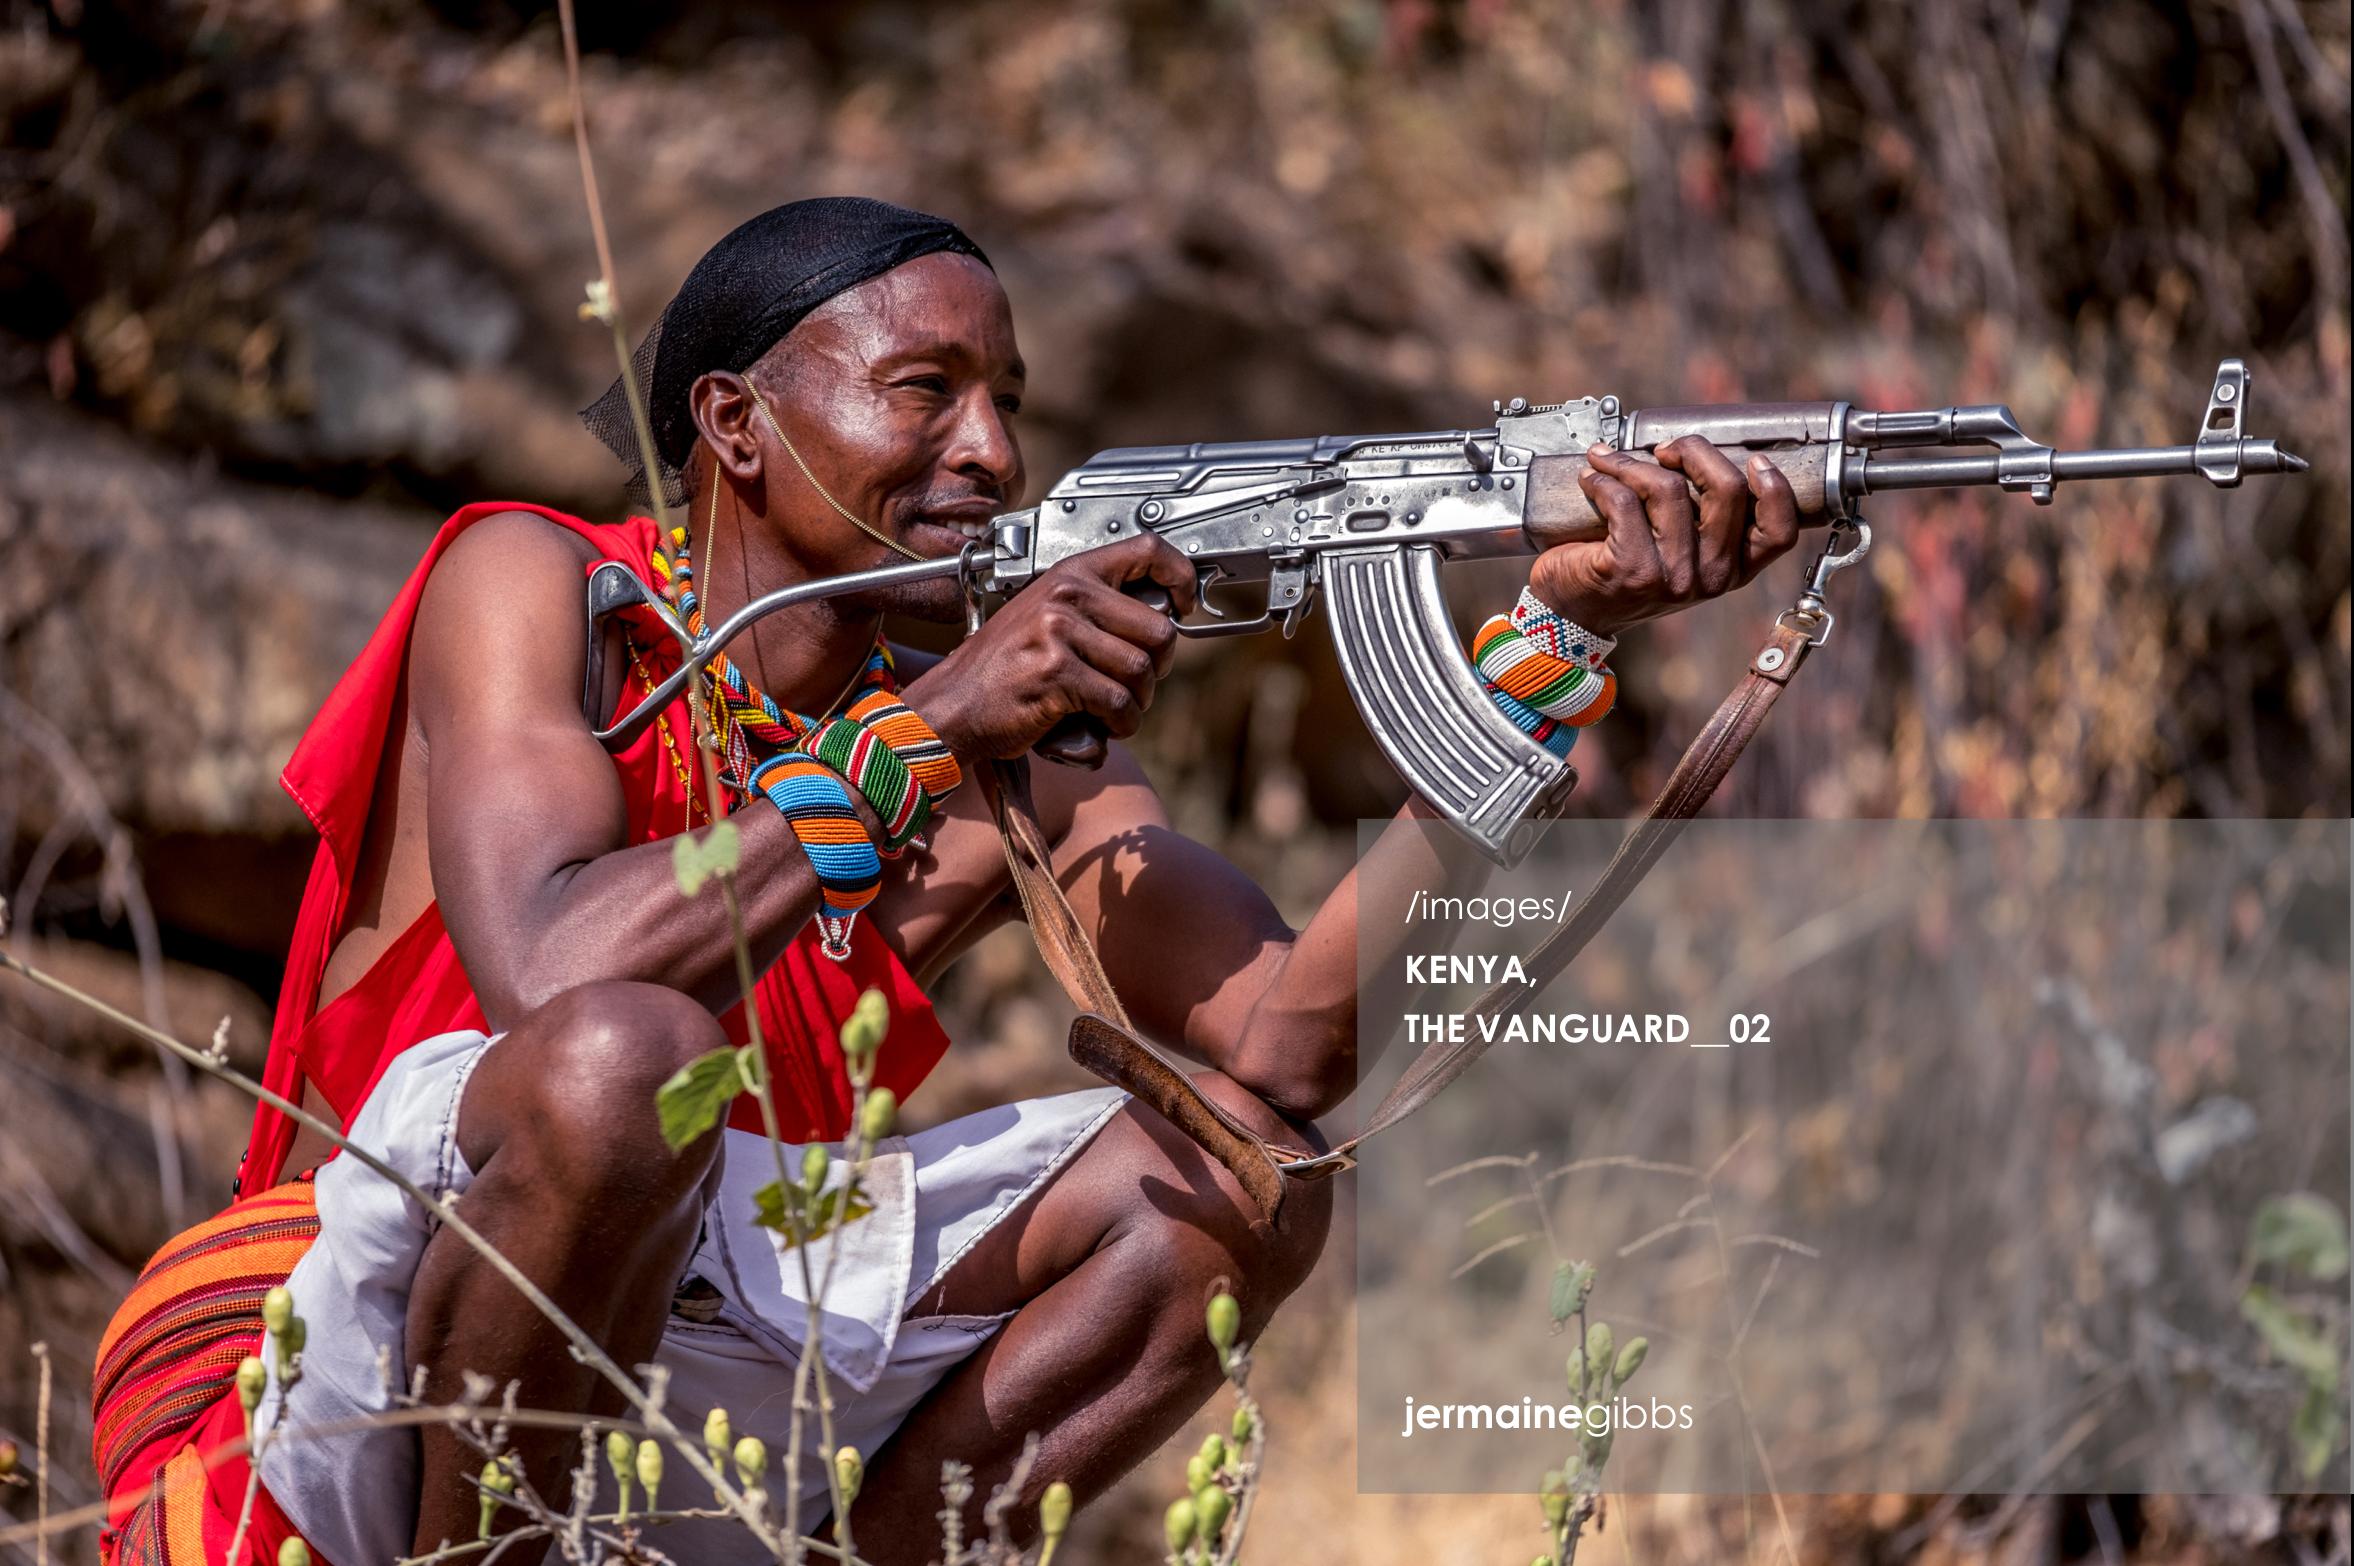 Kenya_The Vanguard__02